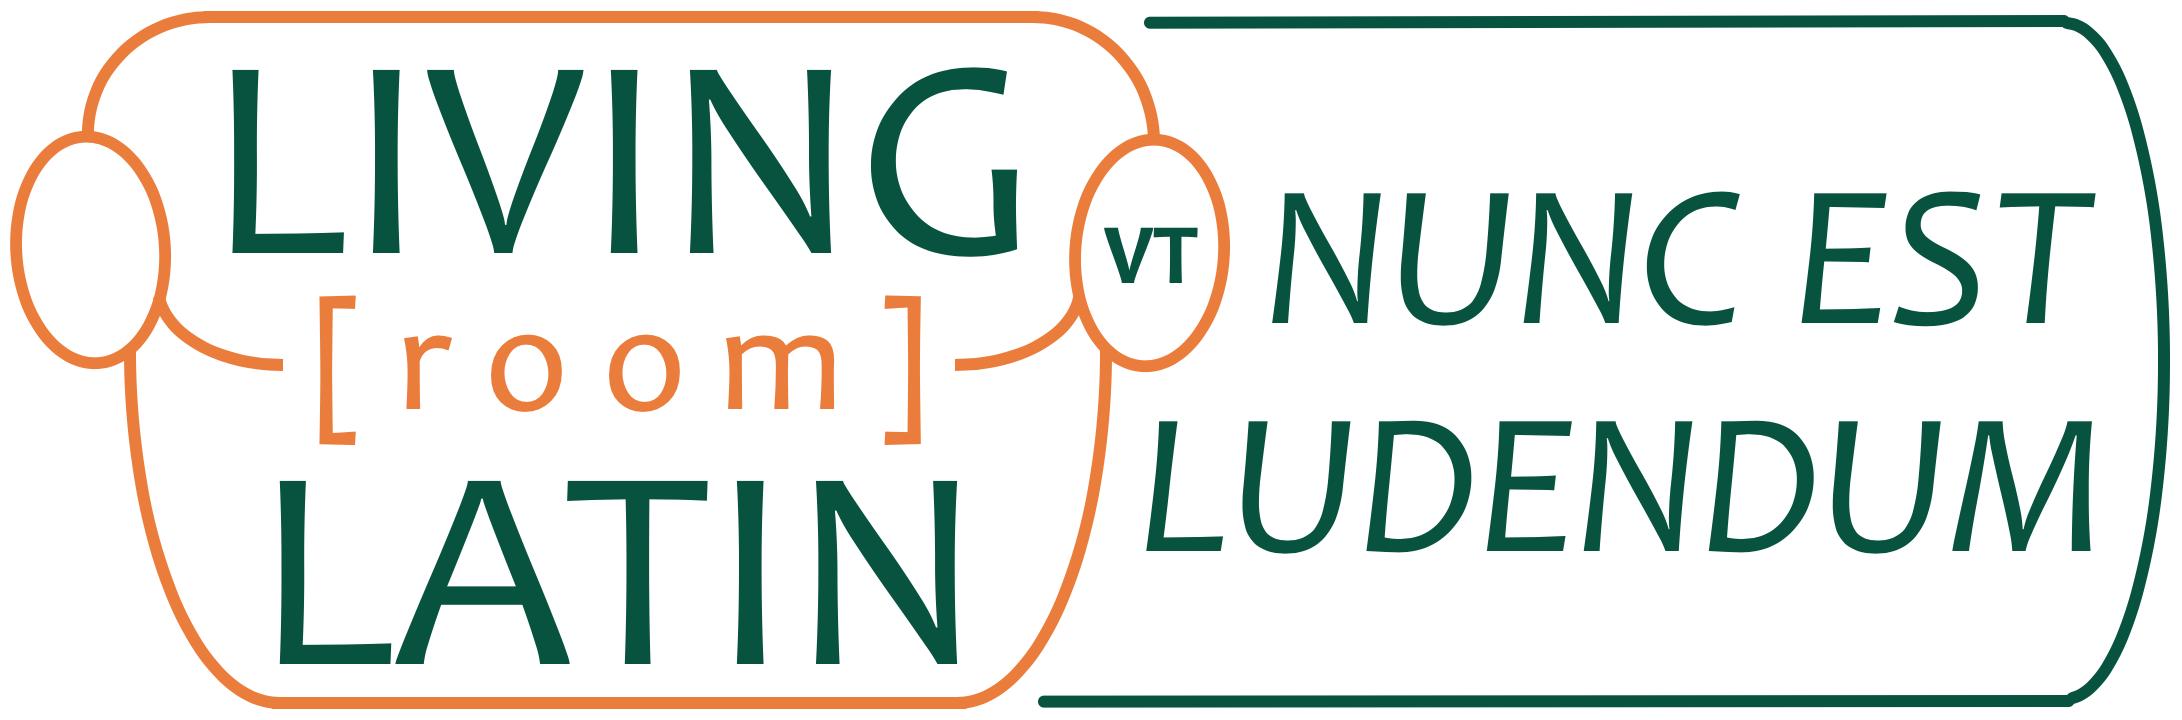 Banner stating Living Room Latin: Nunc est Ludendum